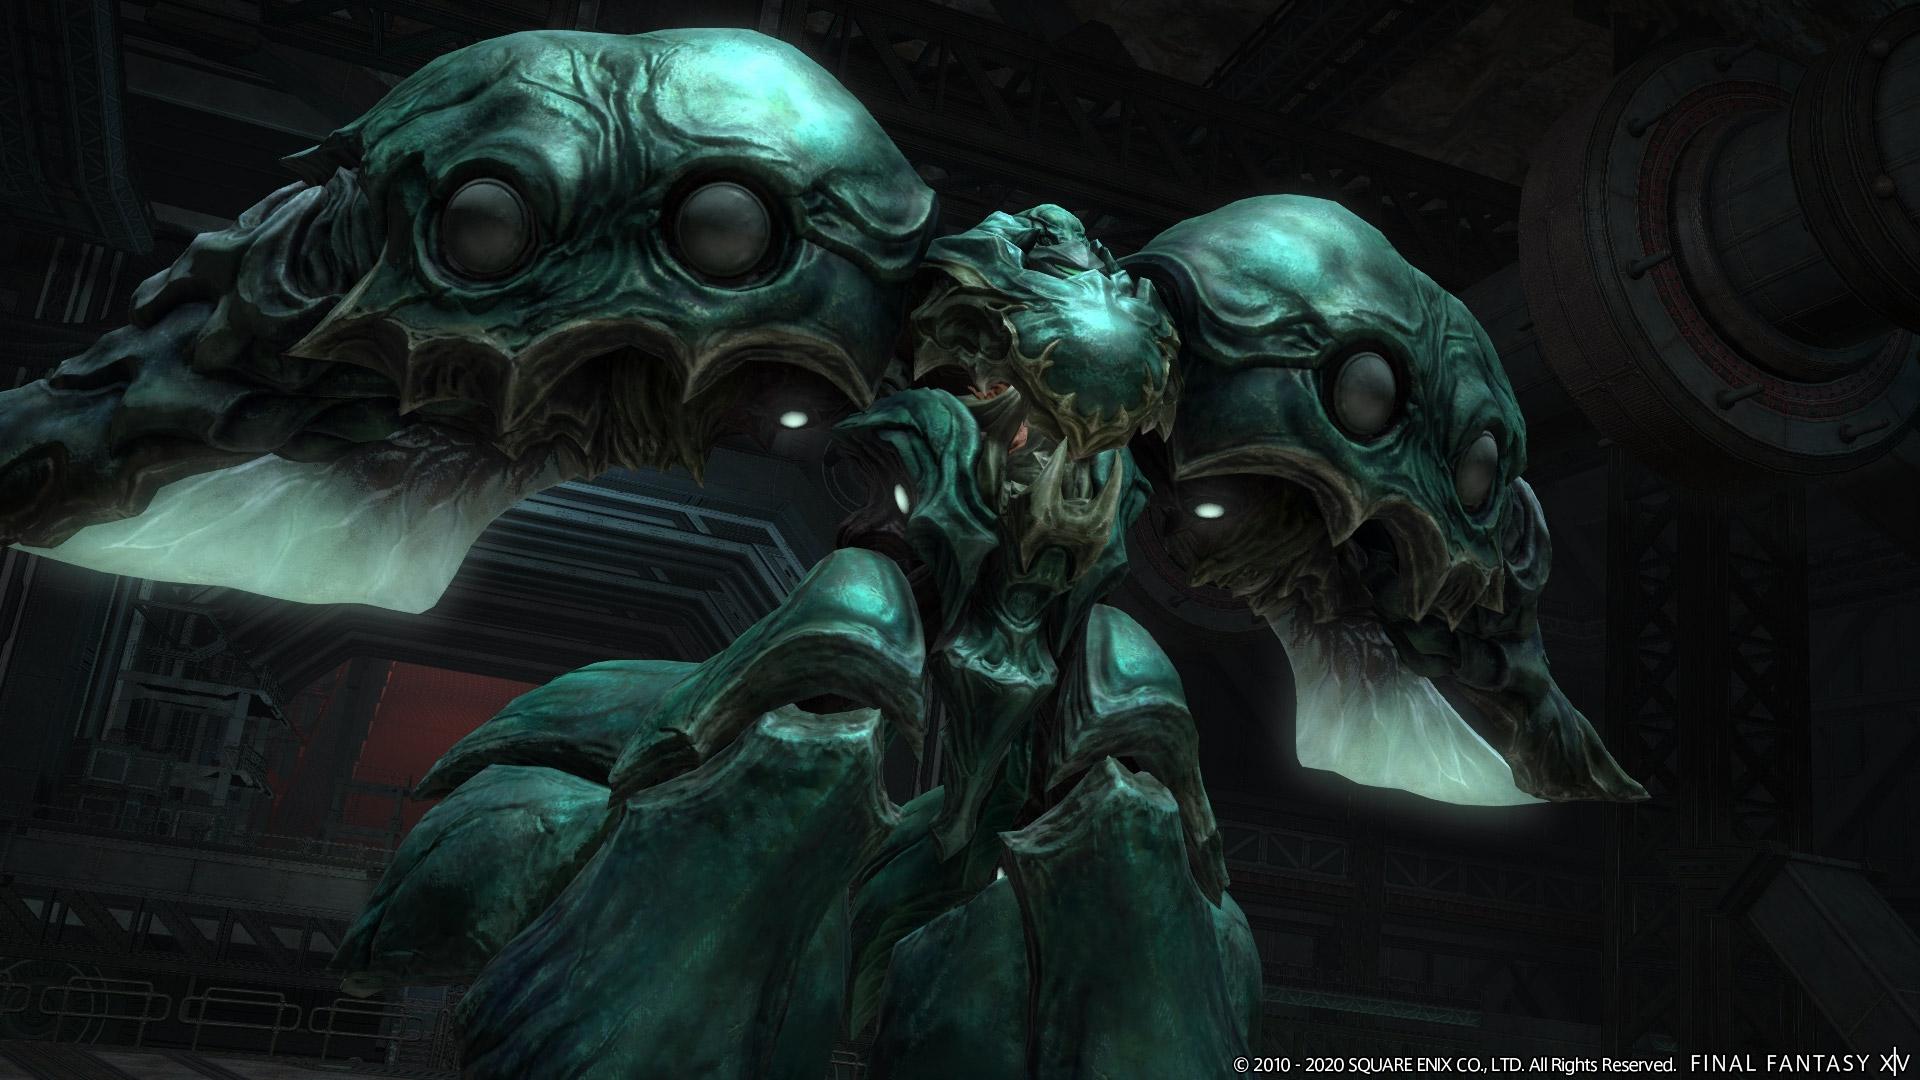 Final Fantasy XIV Patch 5.4 Emerald Weapon